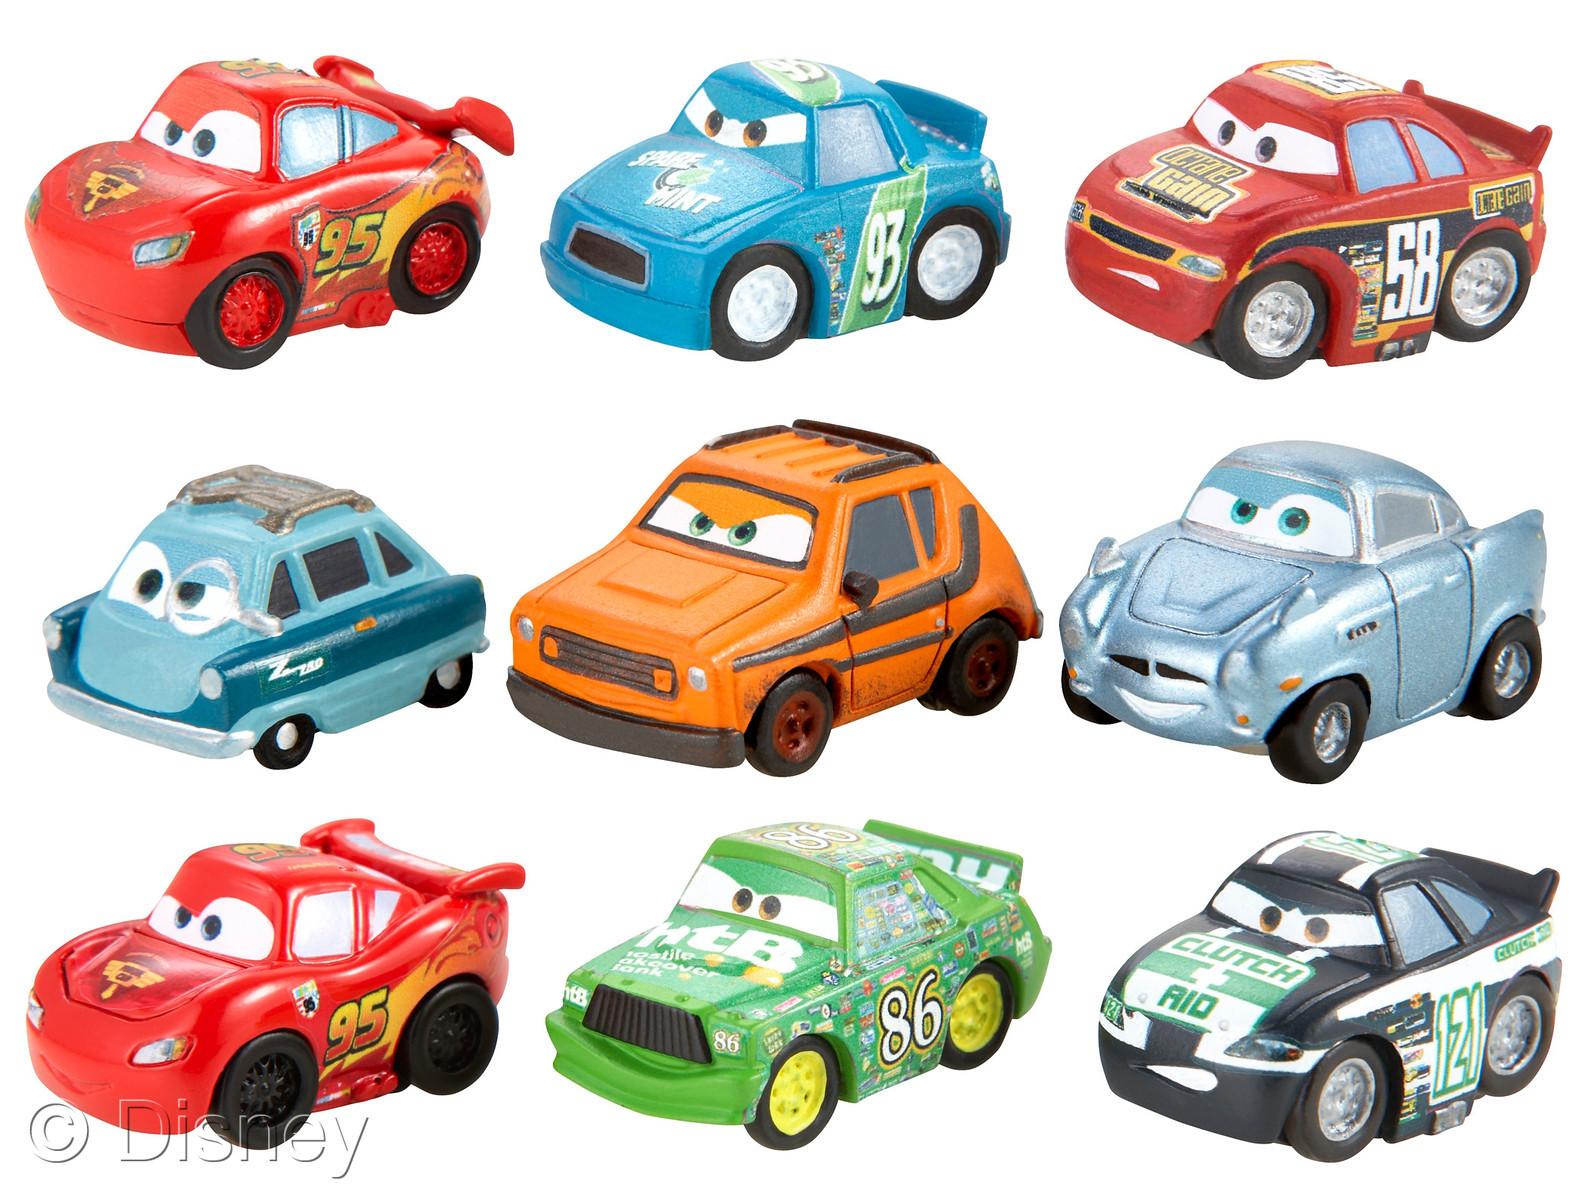 4b2bb881 Disney Holiday Gift Preview 2012: Pixar Merchandise